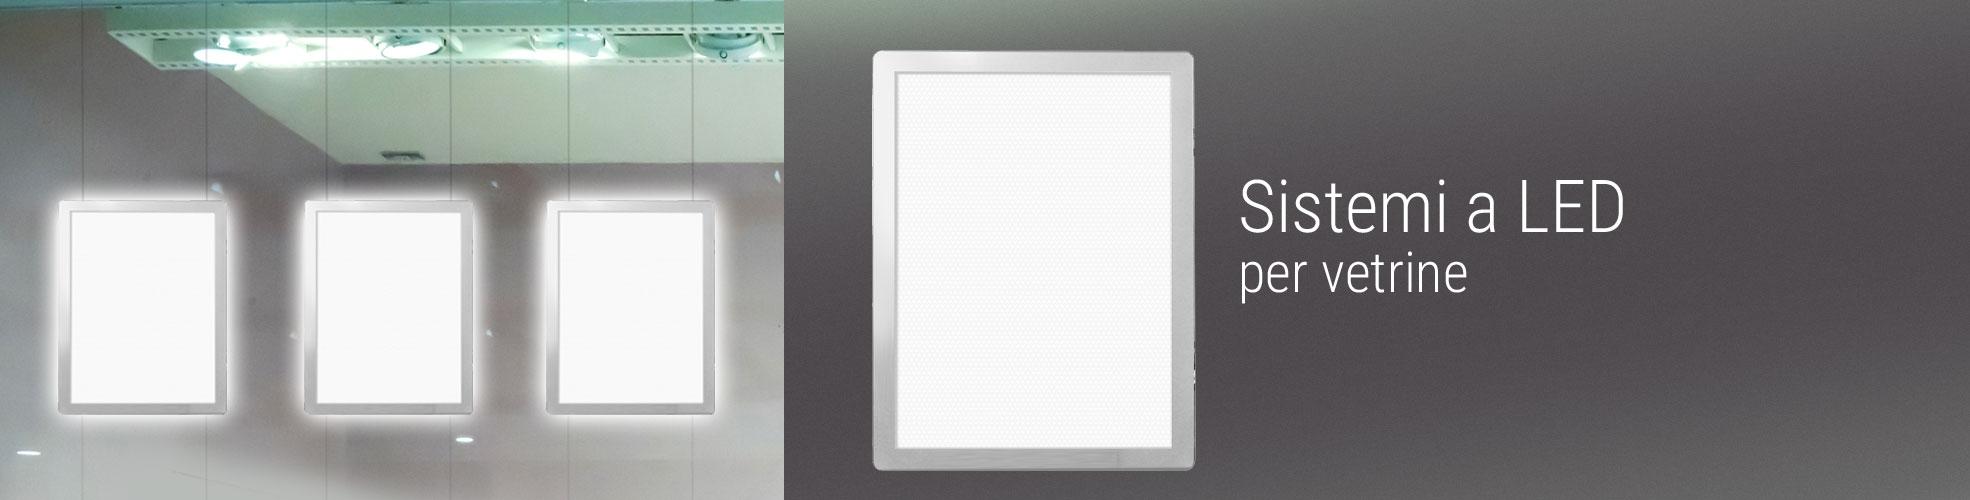 Cornici LED per vetrina